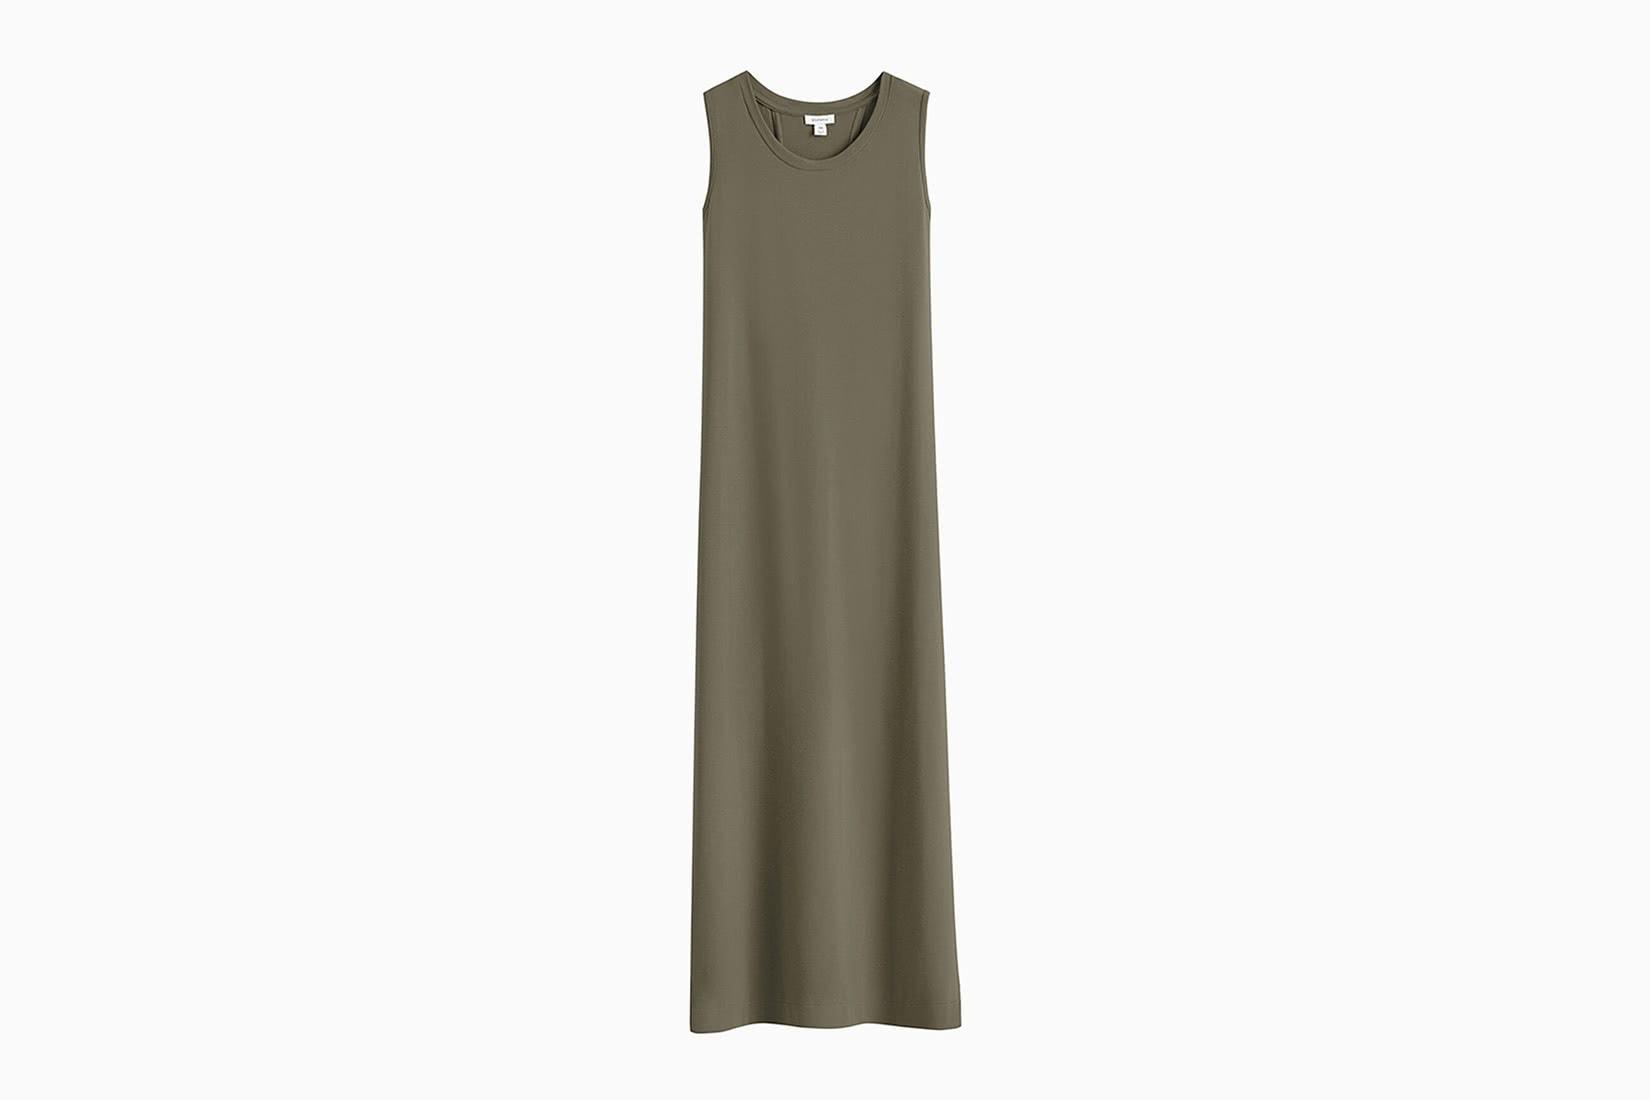 Cuyana drape back dress review - Luxe Digital